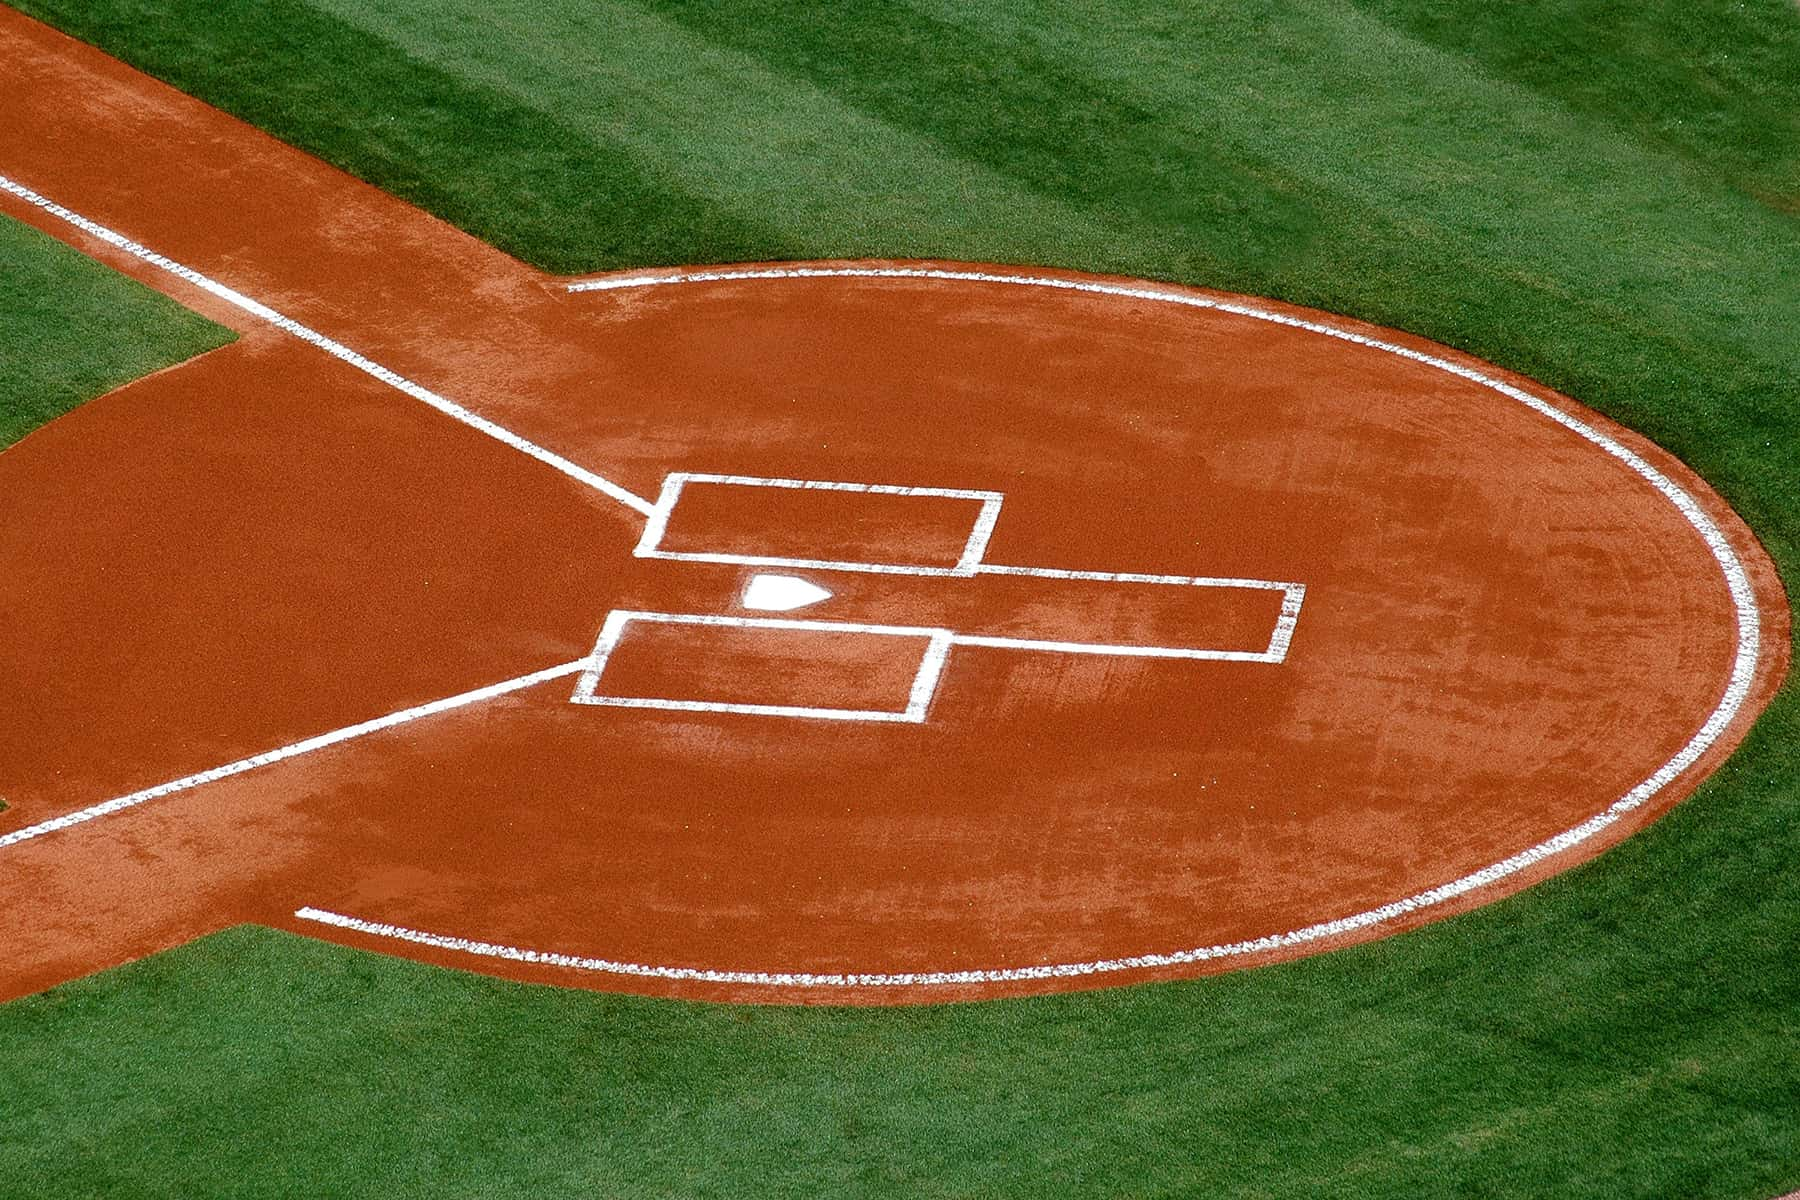 040421_BaseballVoting_02